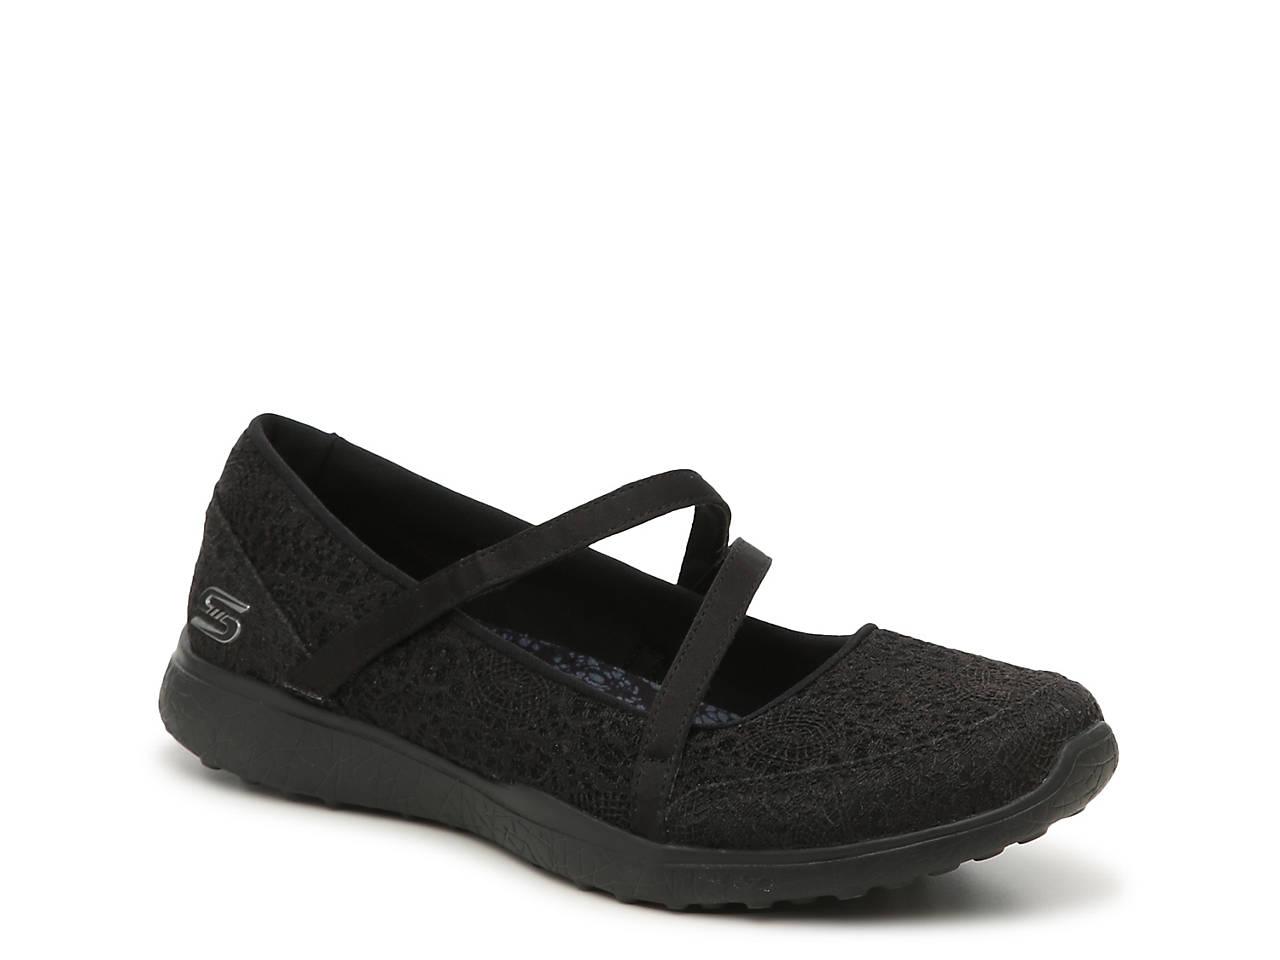 1a6588aeb78e Skechers Sport Pure Elegance Flat Women s Shoes